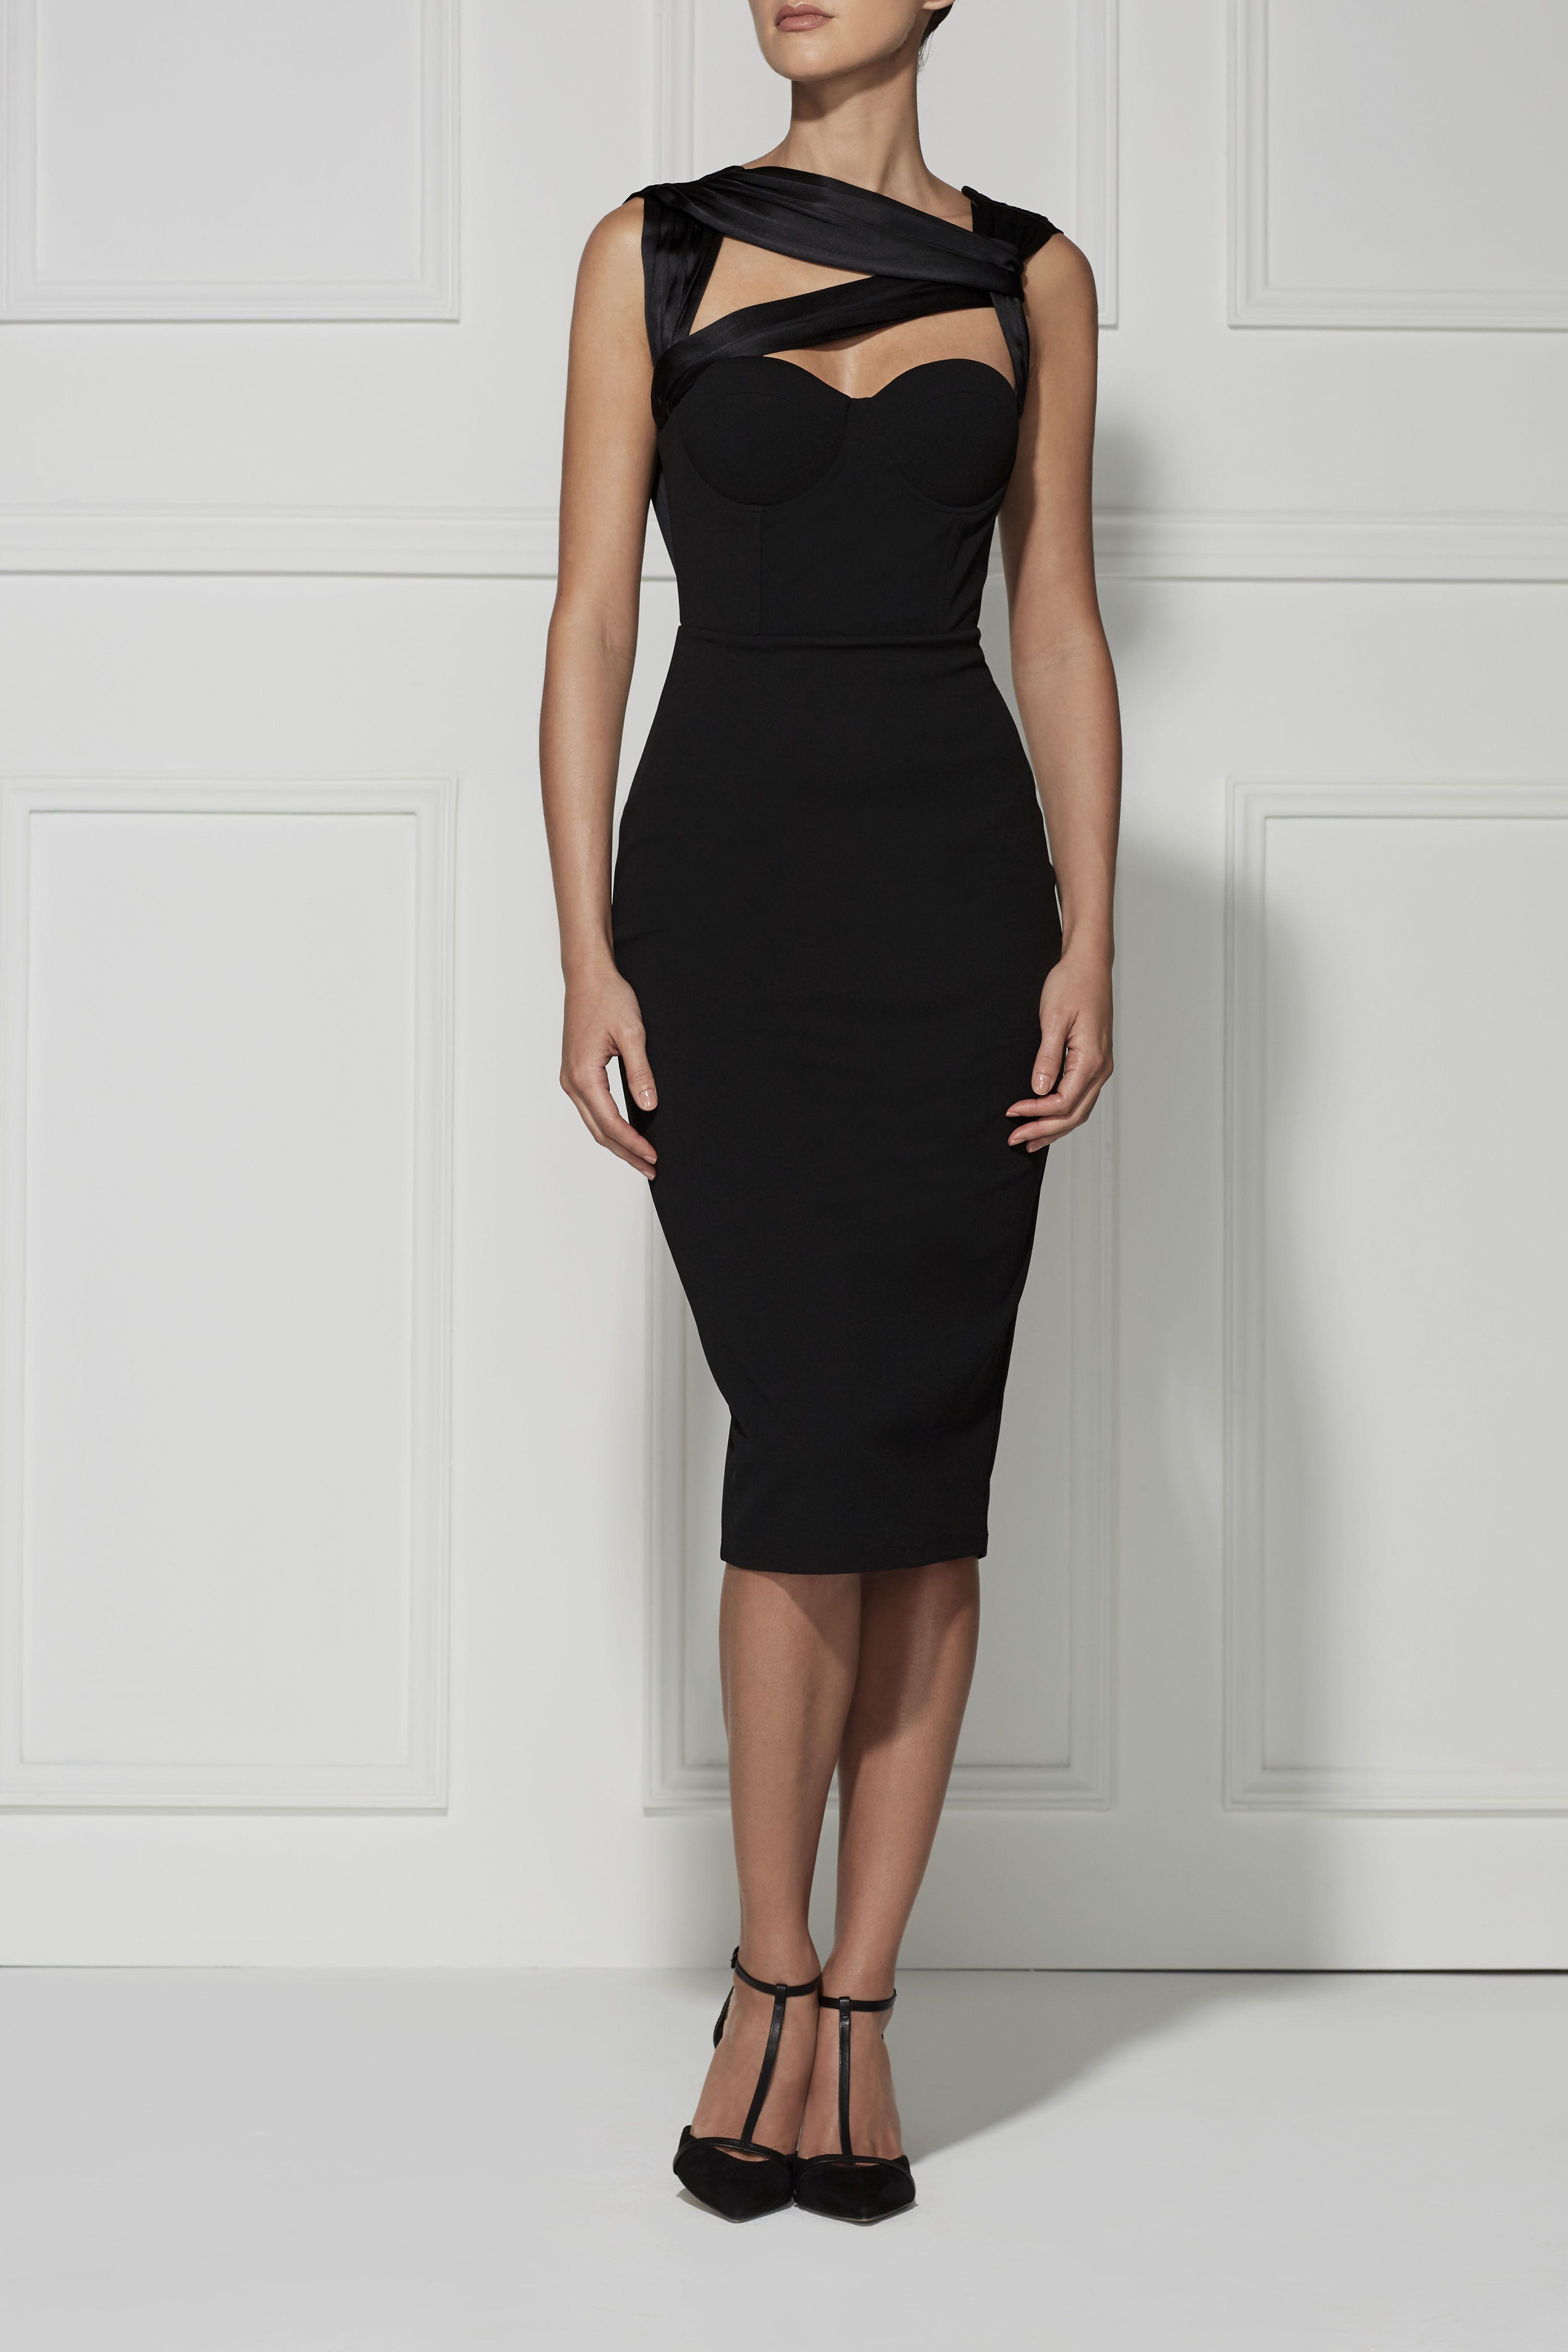 Taline dress misha collection fashion pinterest shopping